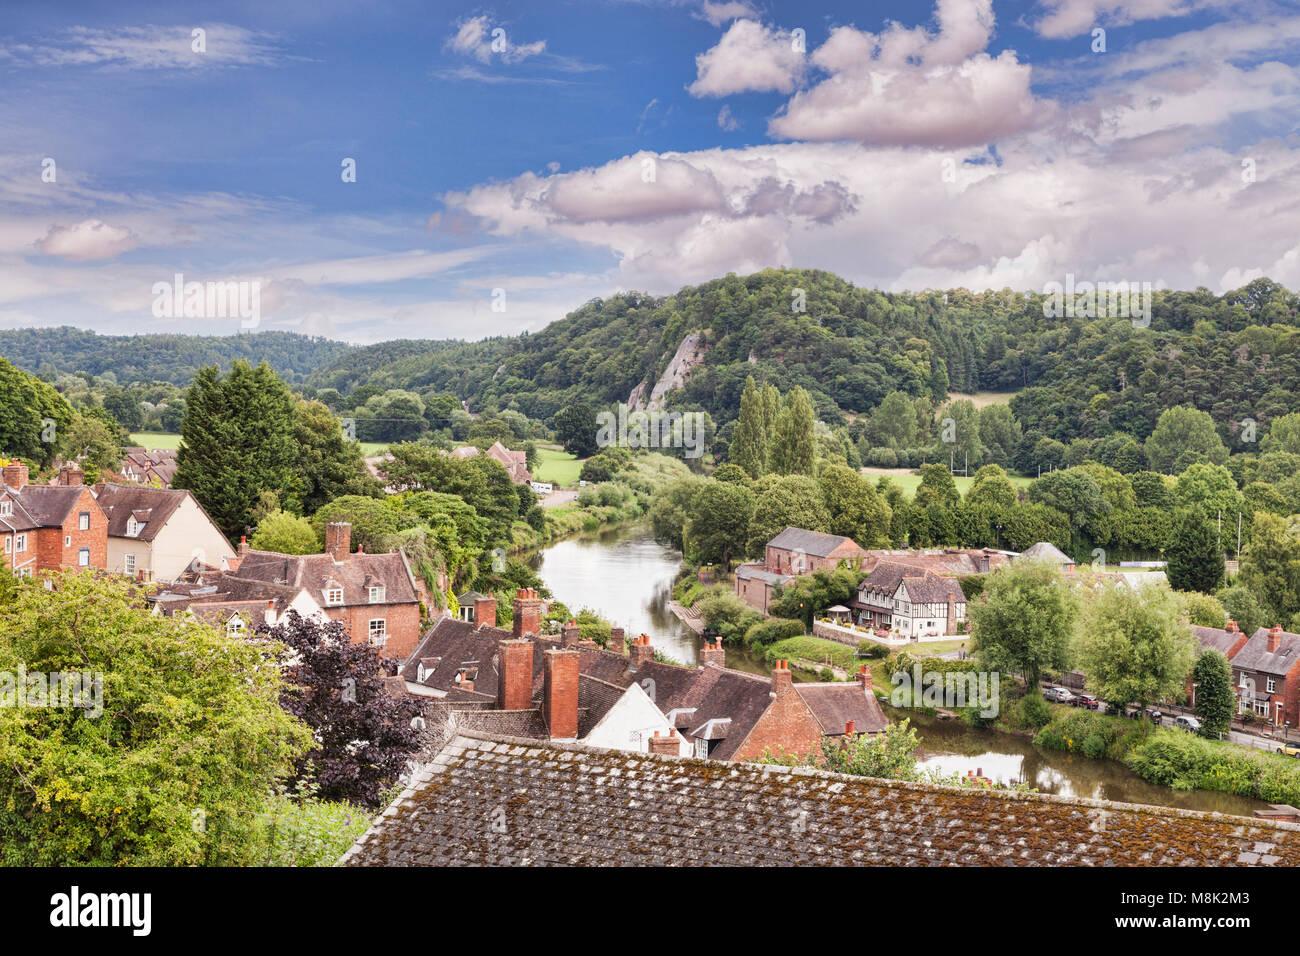 The  River Severn and Bridgnorth , Shropshire, England - Stock Image